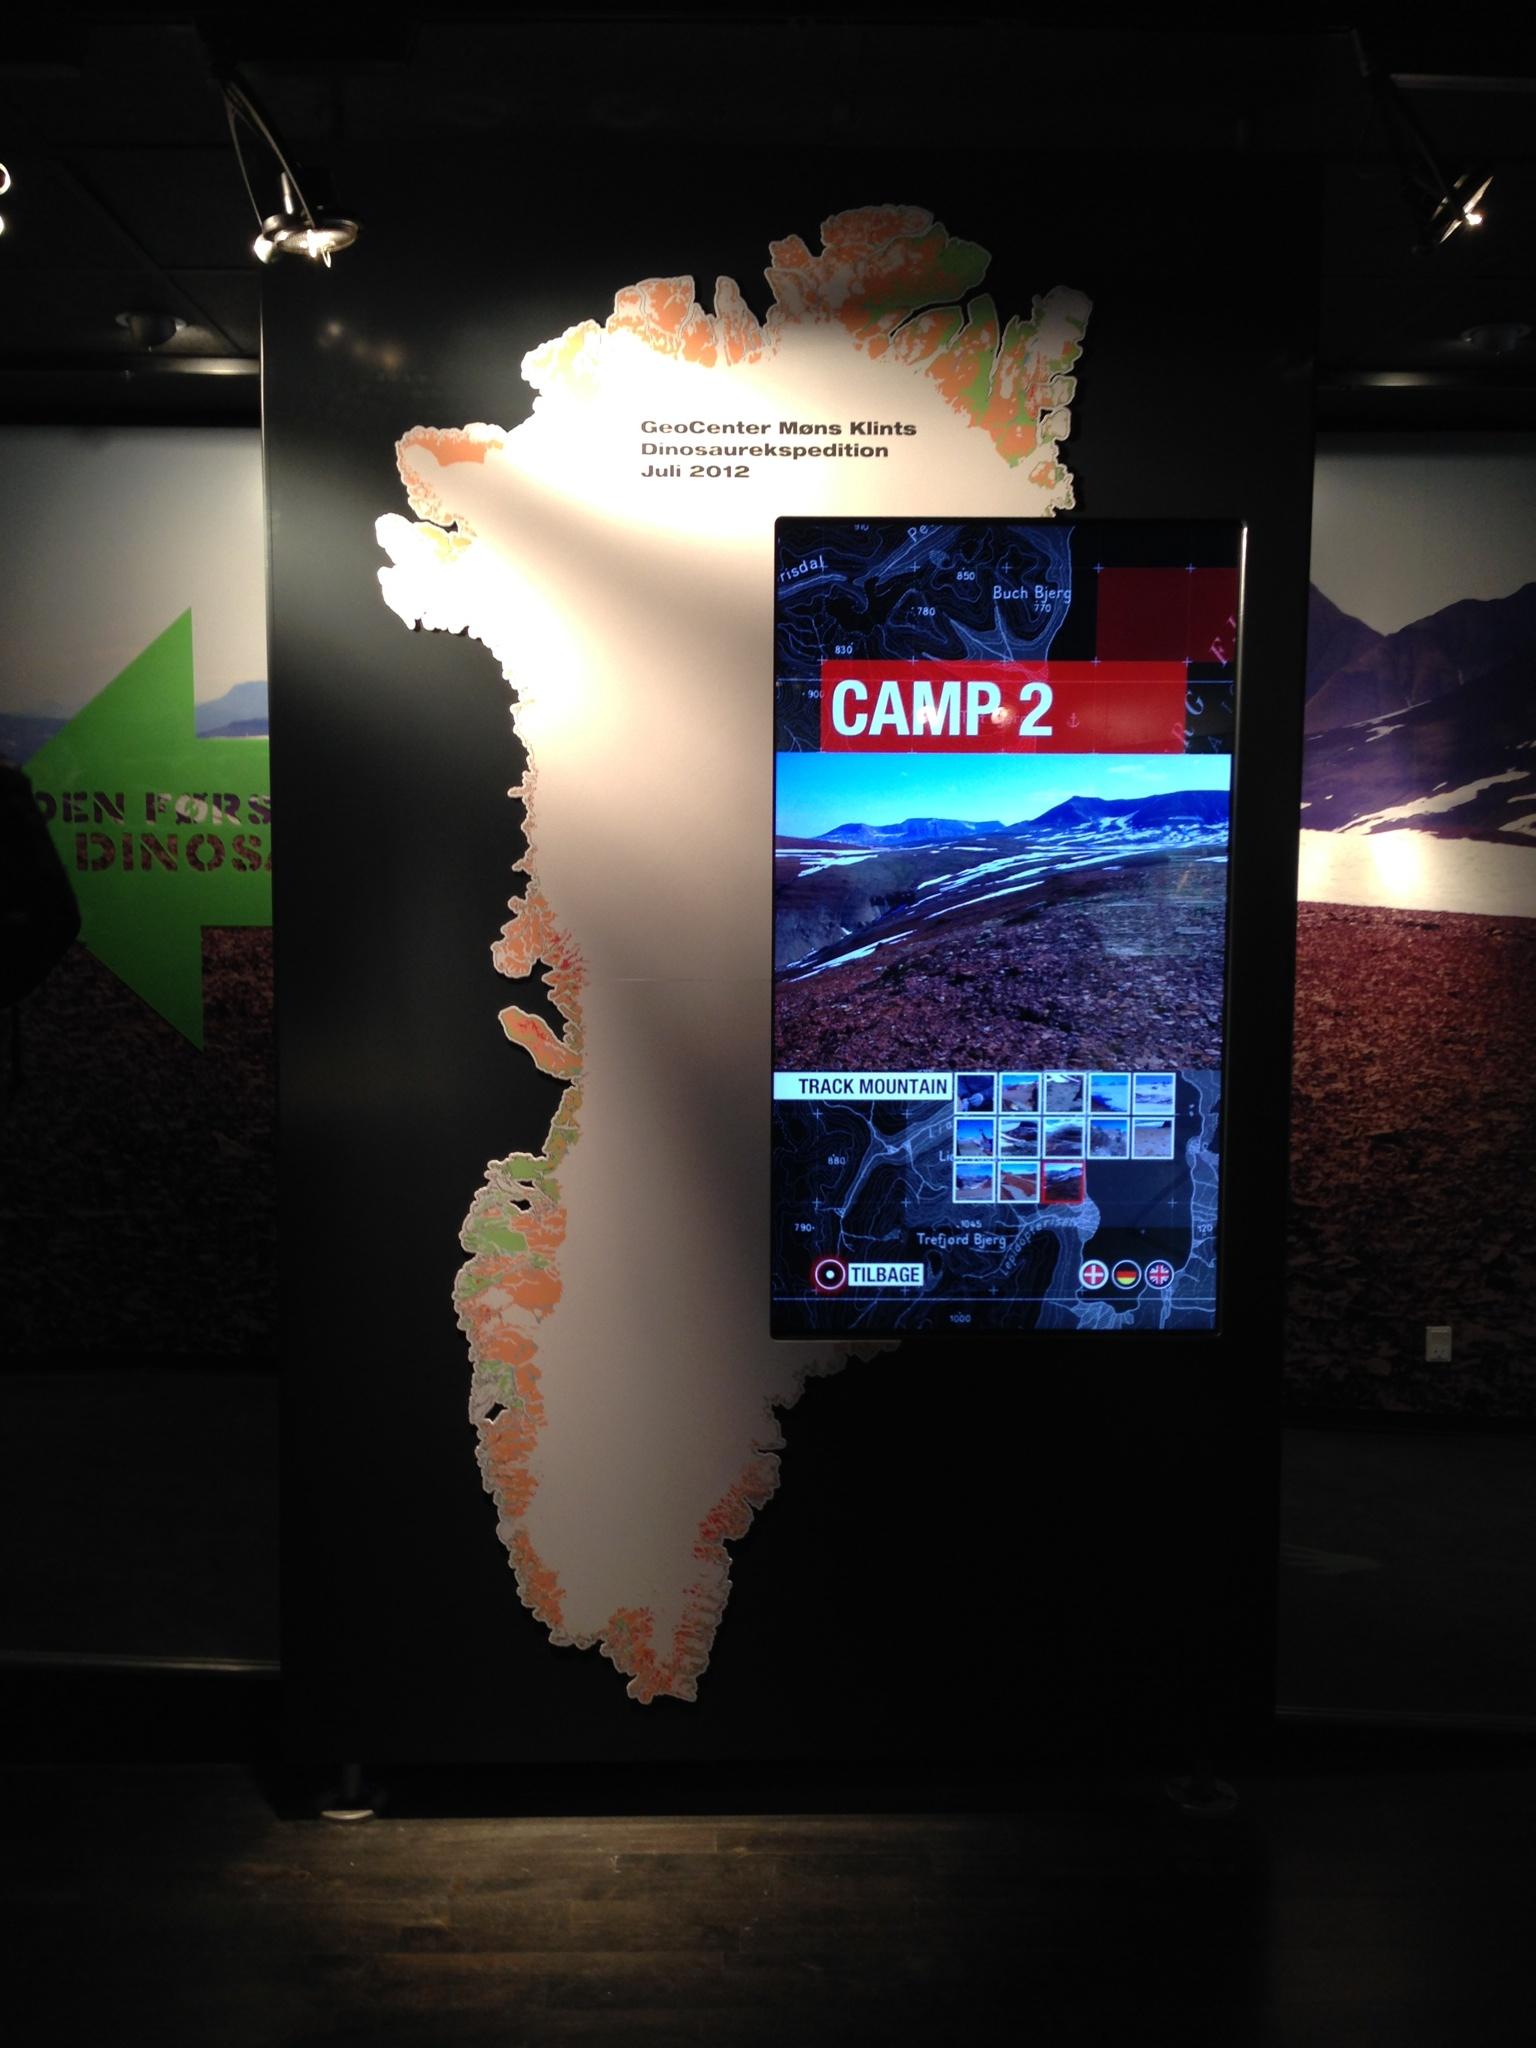 Møns Klint Special Exihibition – The Map